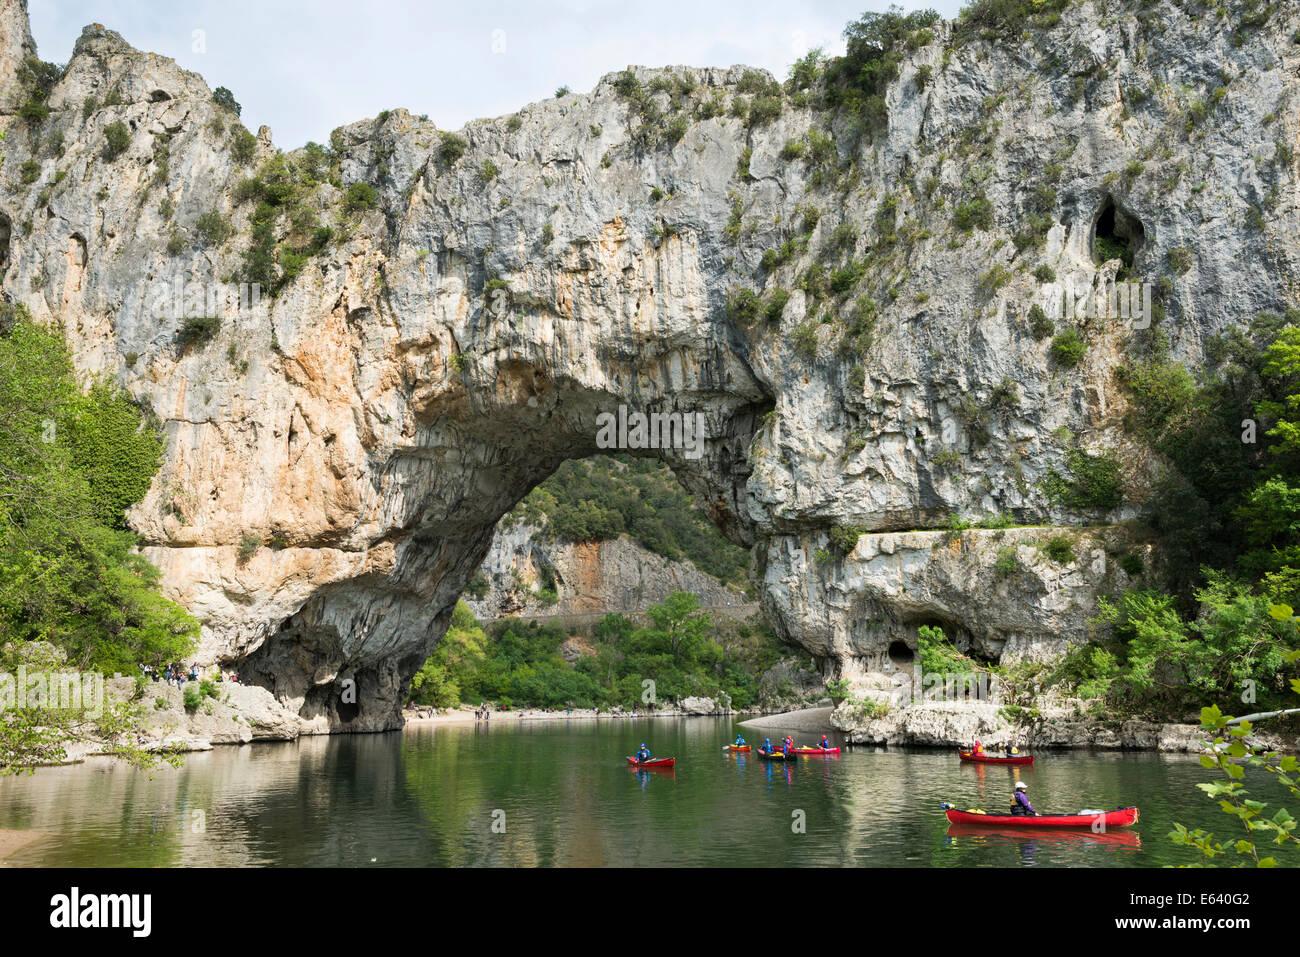 Pont d'Arc, natural rock arch over the Ardèche River, Ardèche Gorges, Gorges de l'Ardèche, - Stock Image